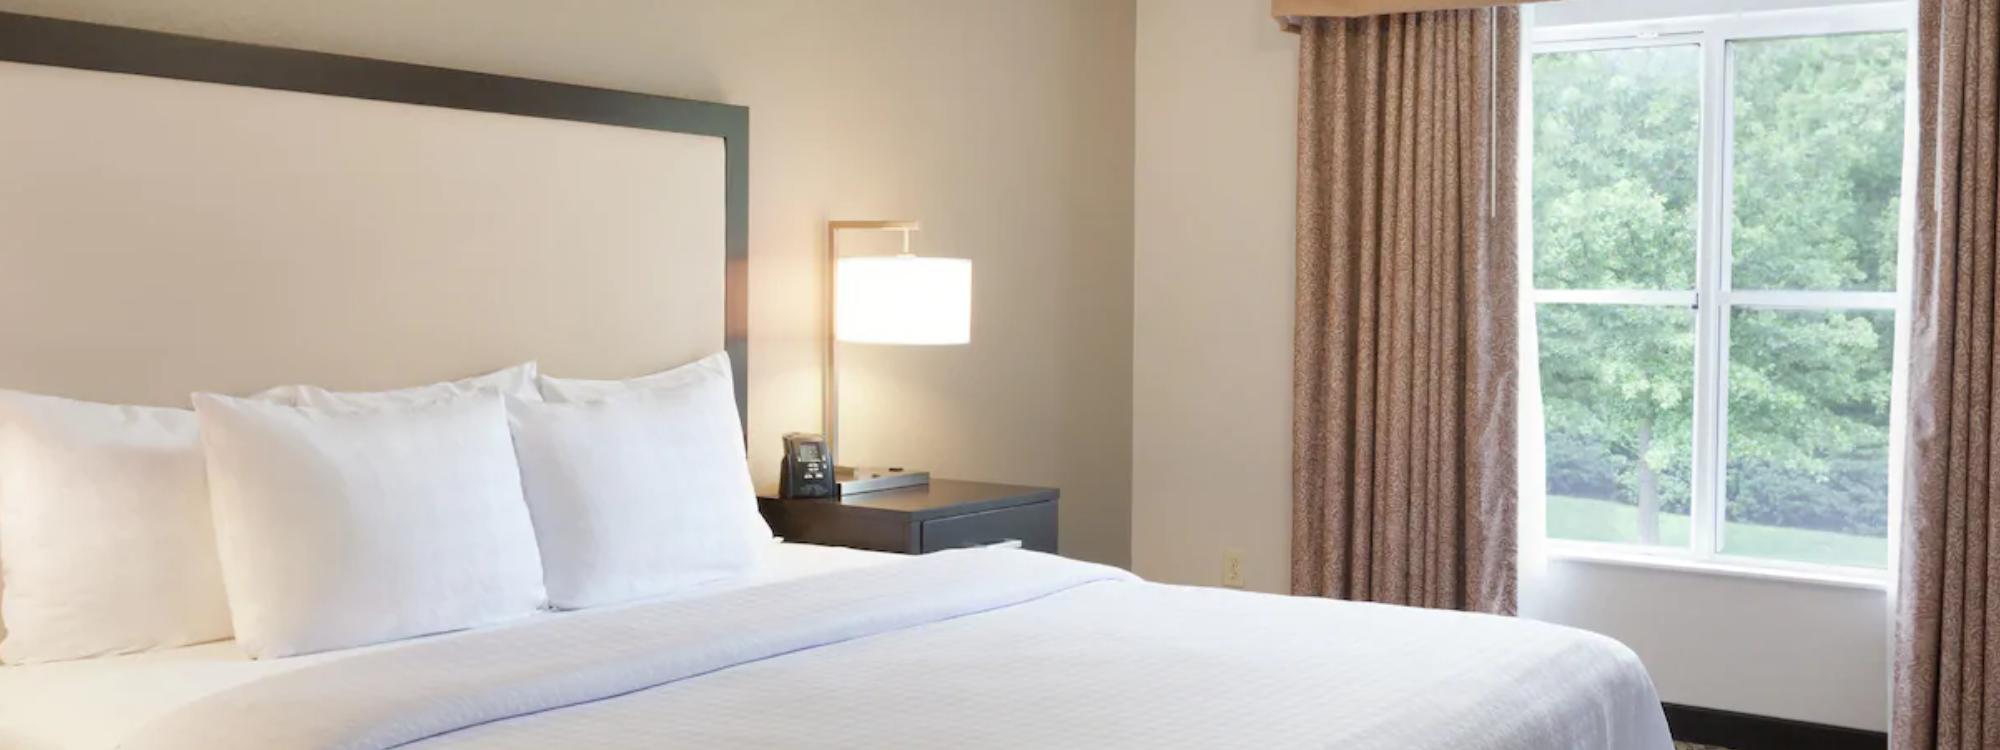 https://www.hotelsbyday.com/_data/default-hotel_image/3/18203/screenshot-2020-06-11-at-4-22-48-pm.png